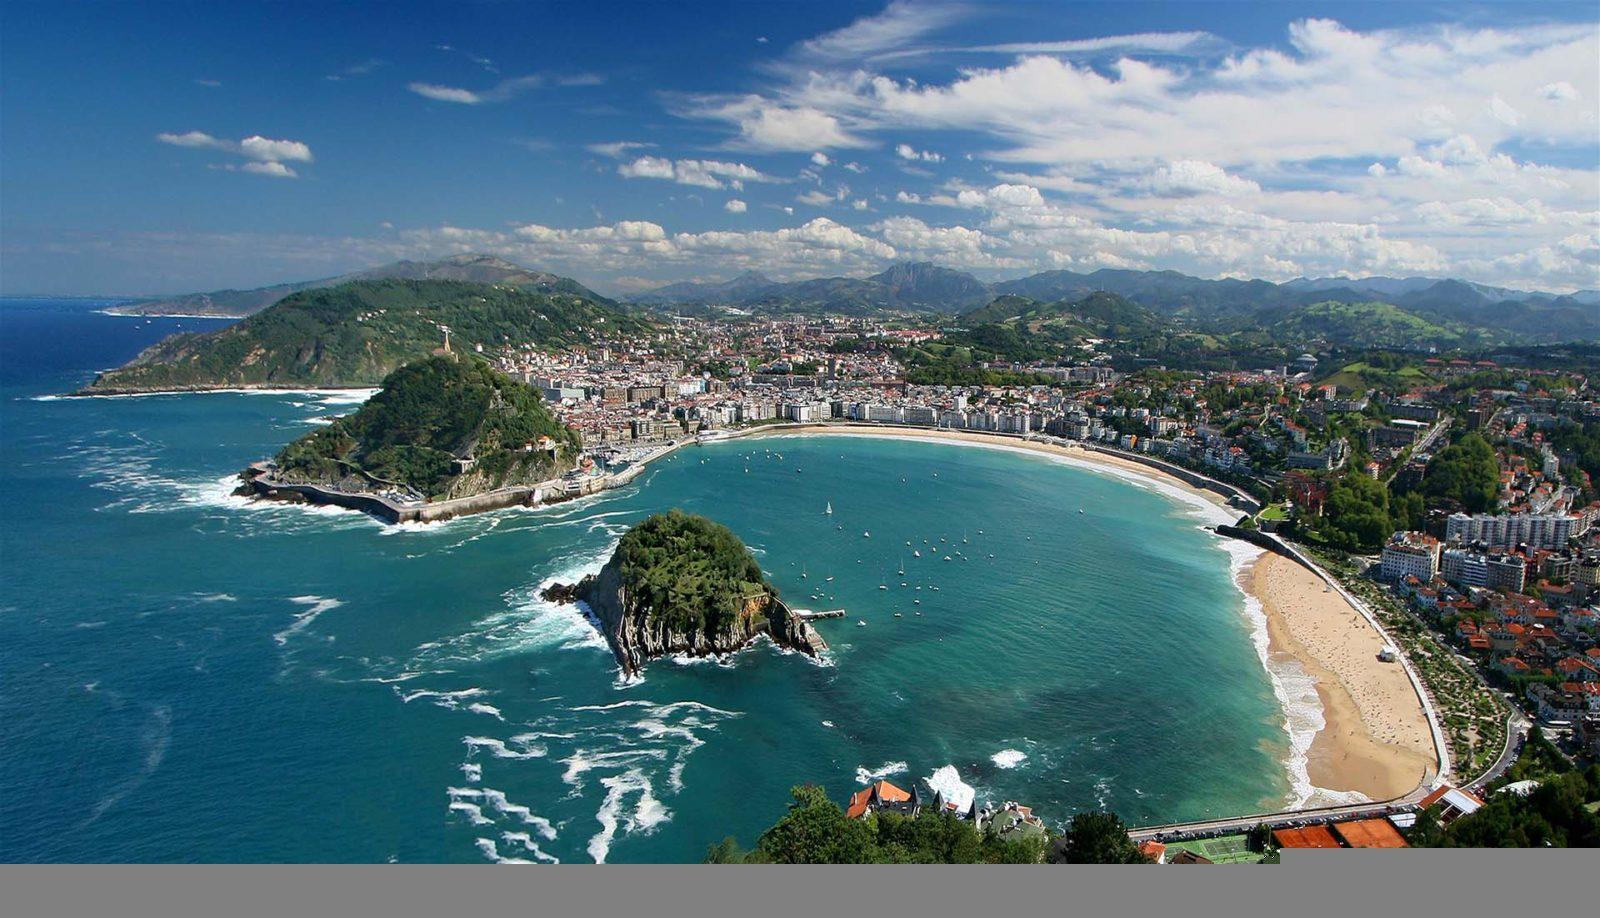 пляжЛа-Конча в Испании